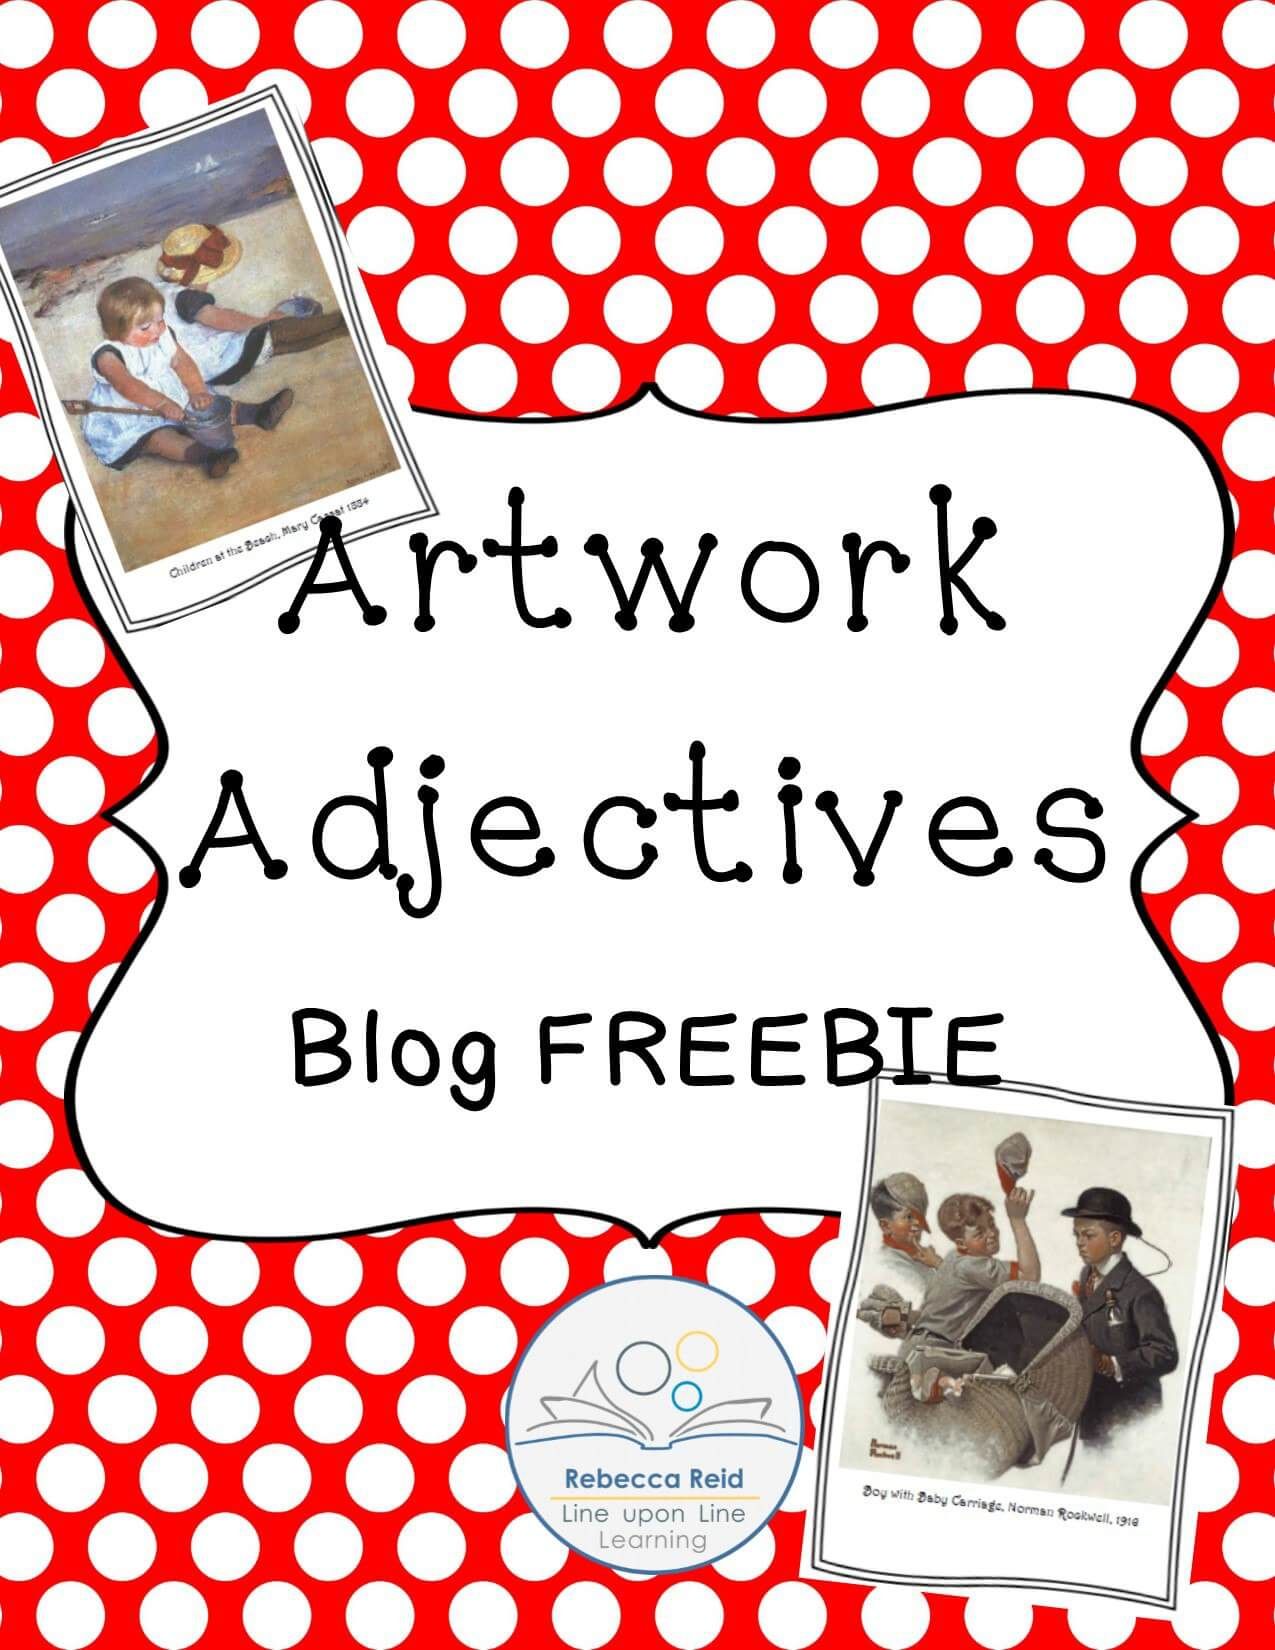 artwork adjectives-blog cover